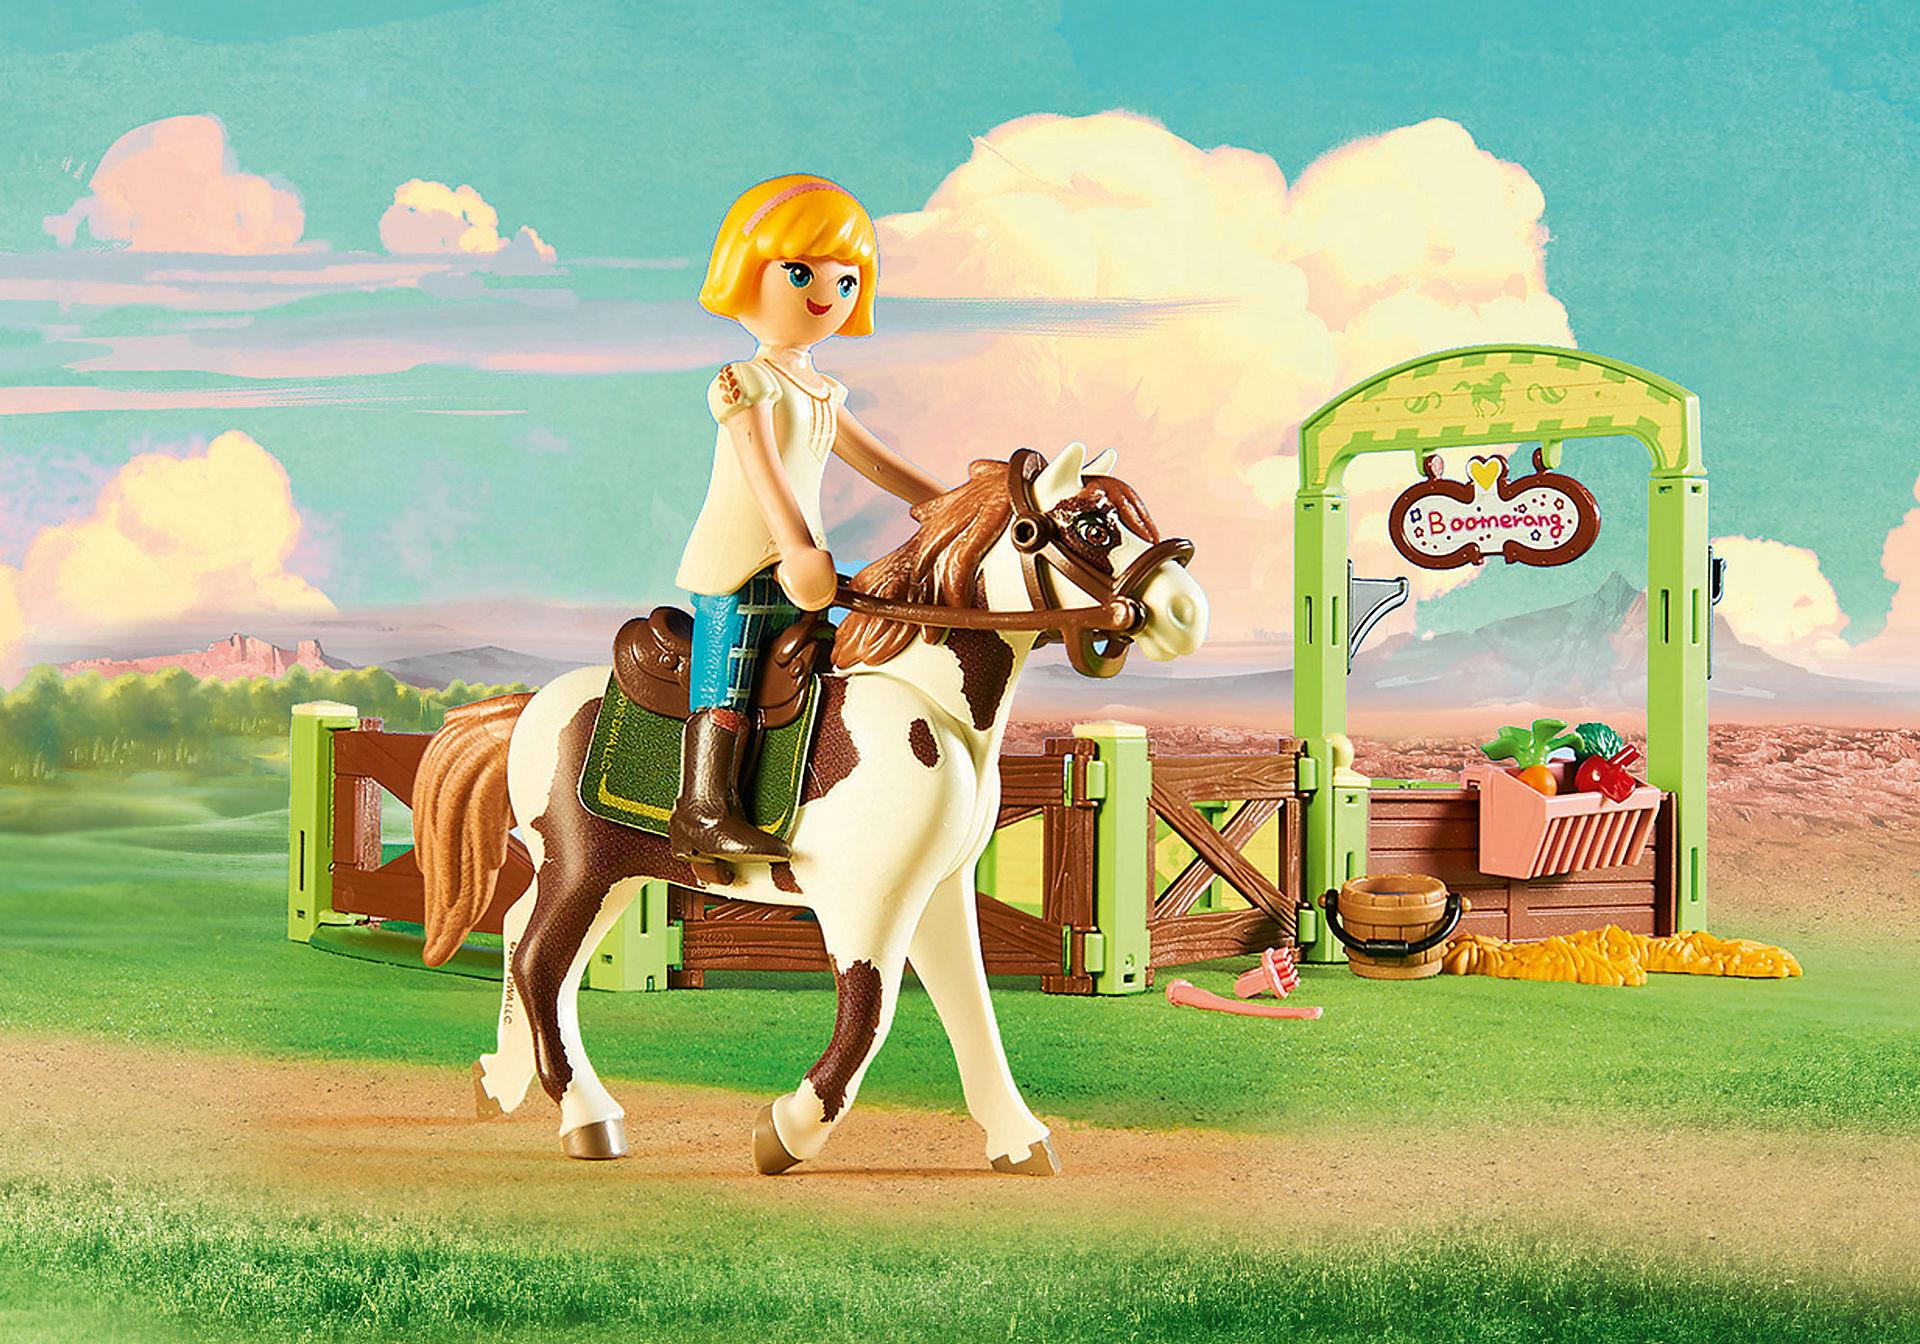 http://media.playmobil.com/i/playmobil/9480_product_extra1/Η Άμπιγκεϊλ με το άλογο Μπούμερανγκ